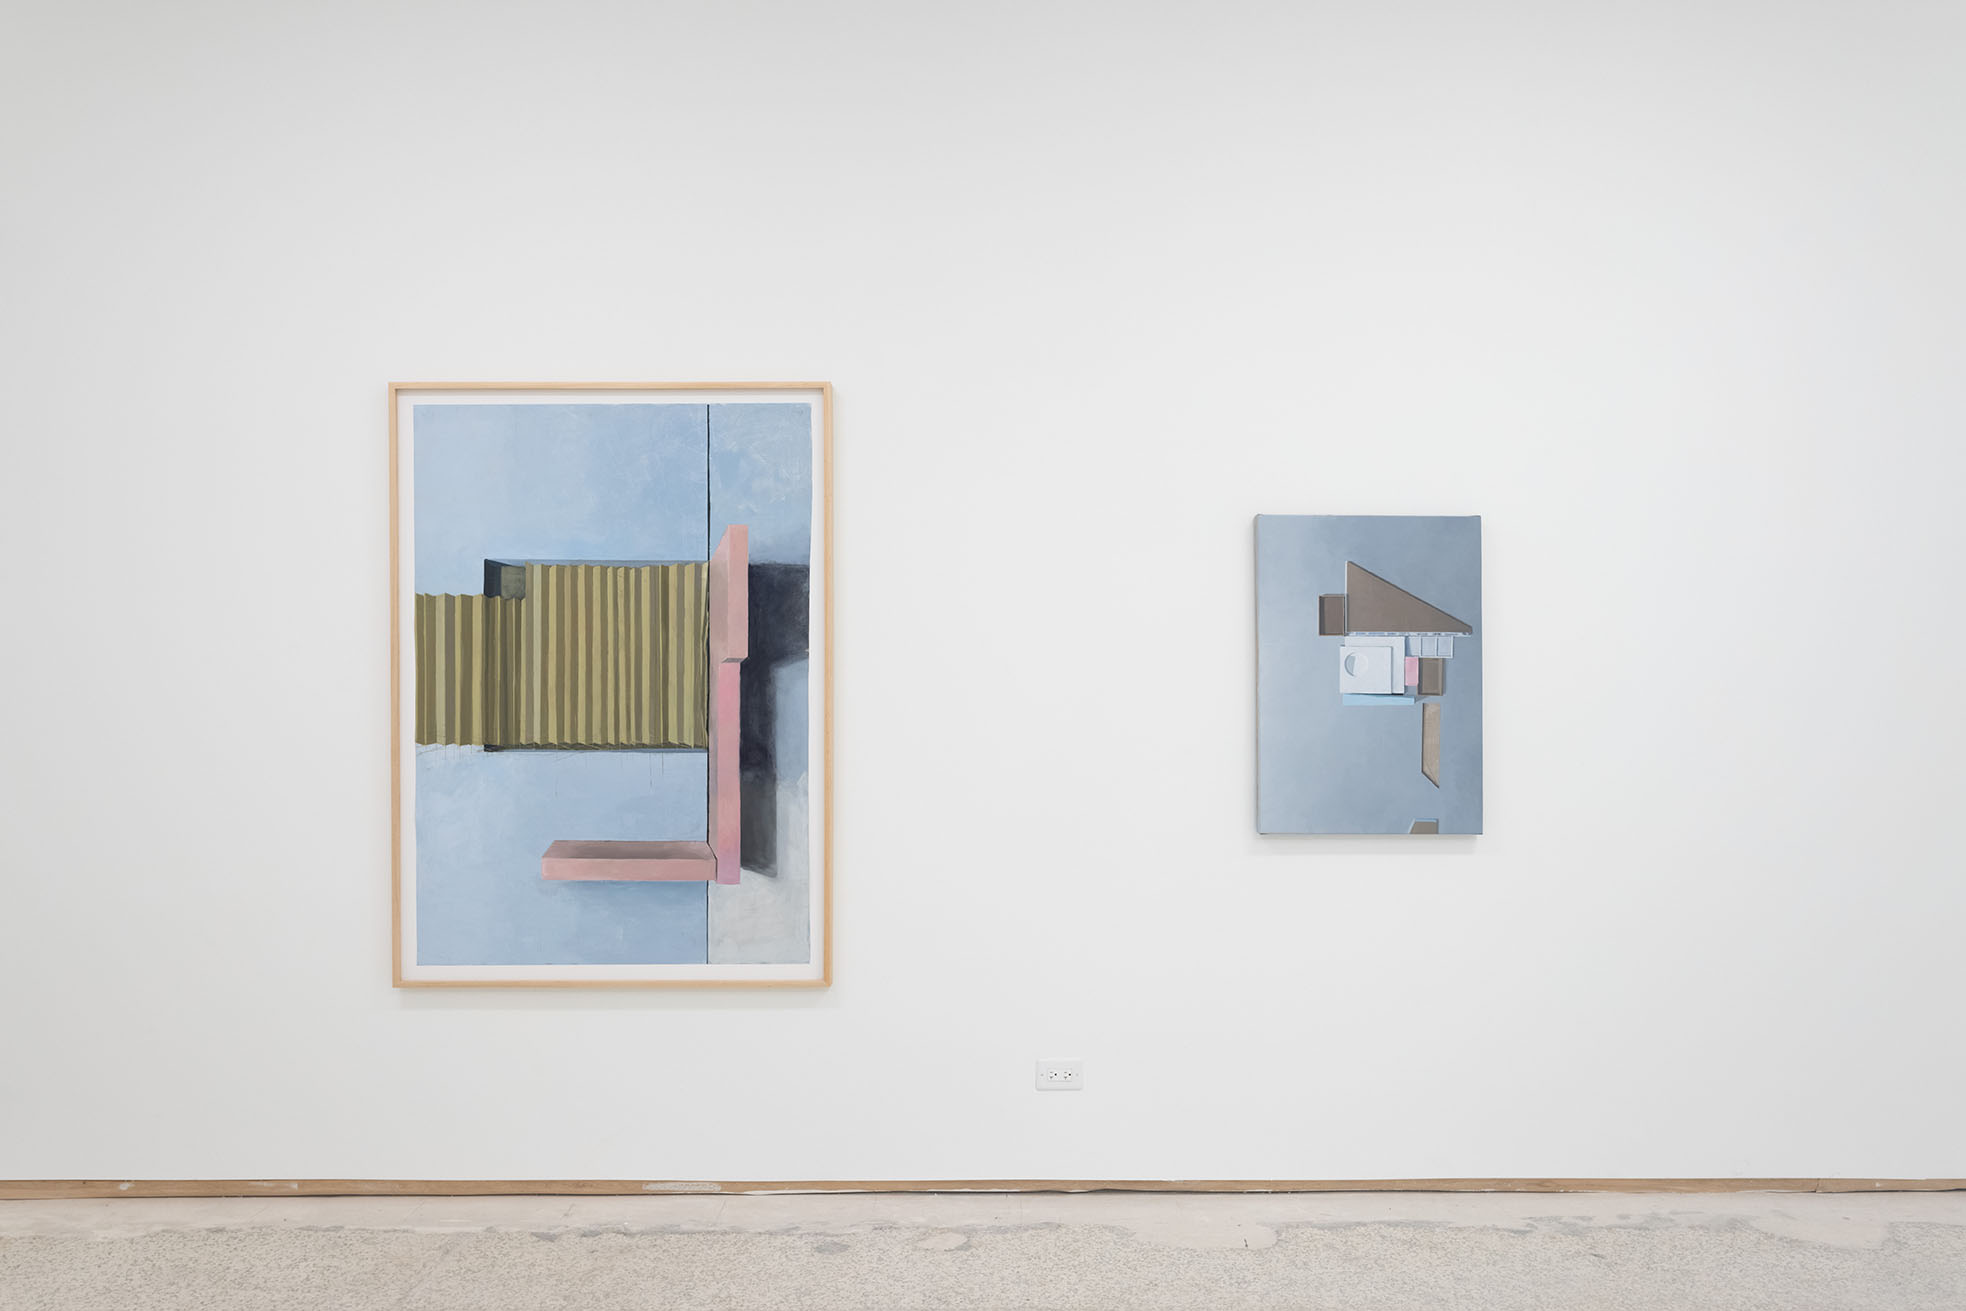 Jenny Brillhart_Emerson Dorsch Gallery_Housekeeping_2021